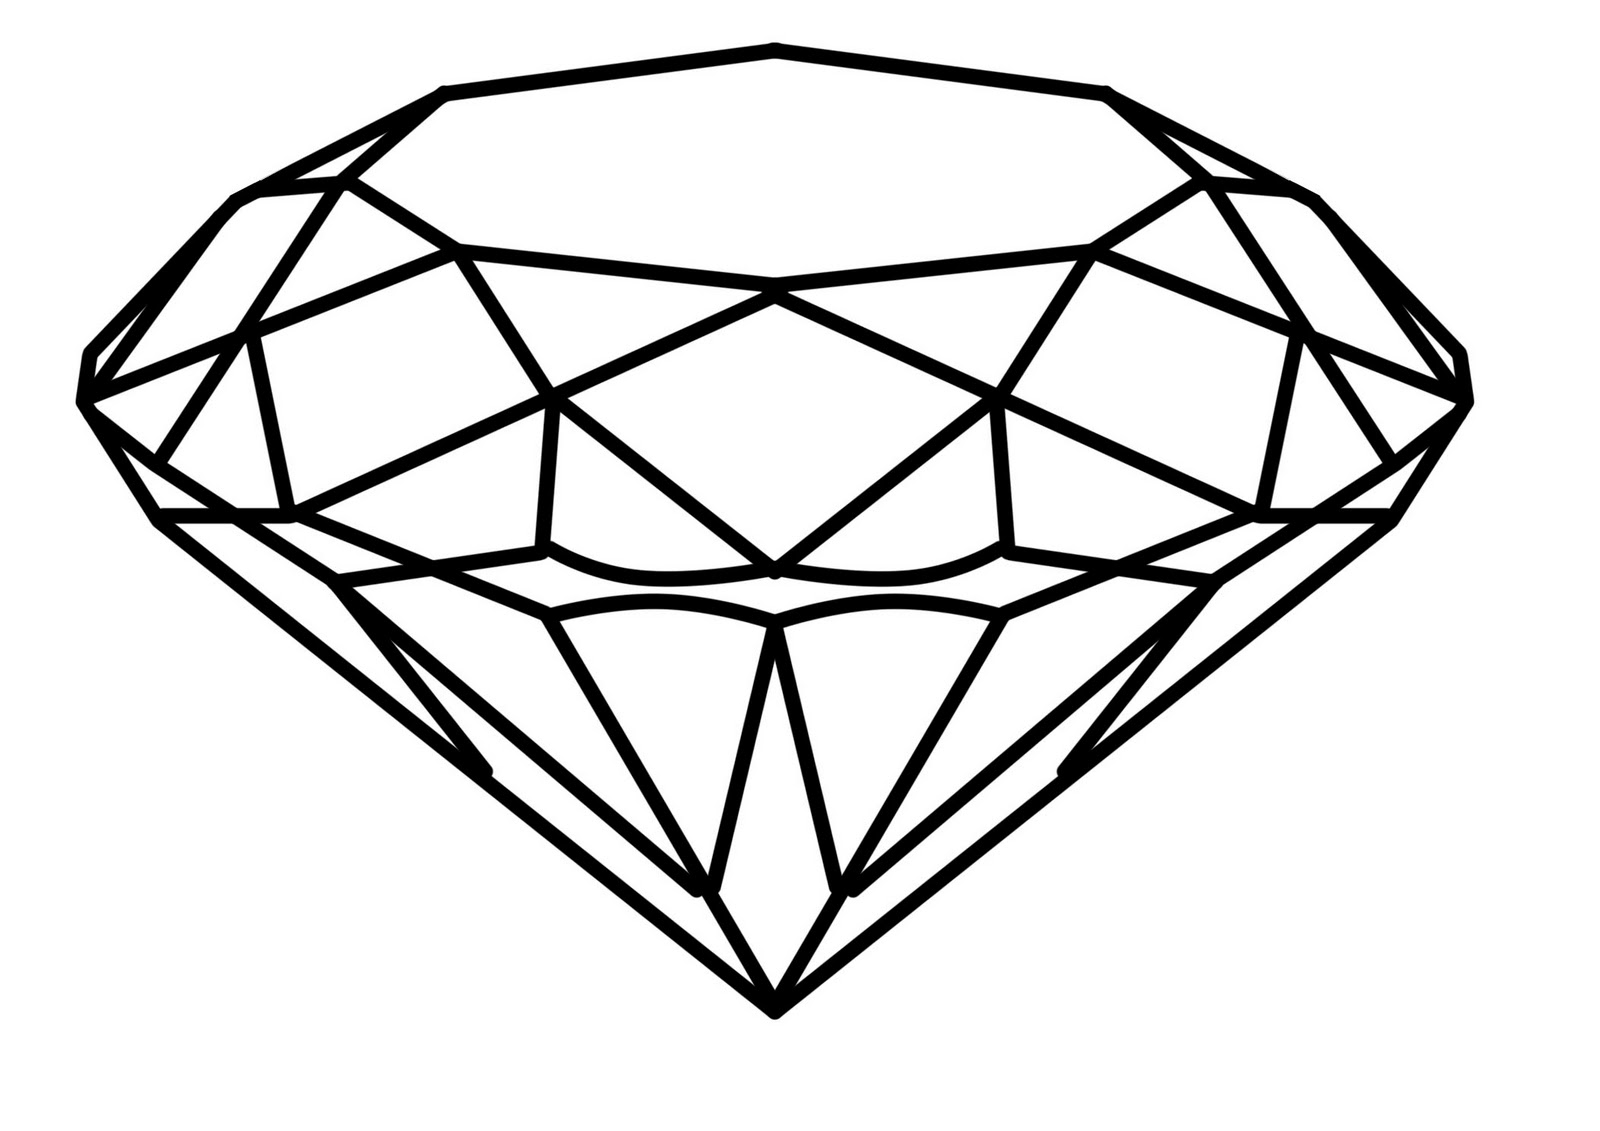 Diamond logo clipart 2